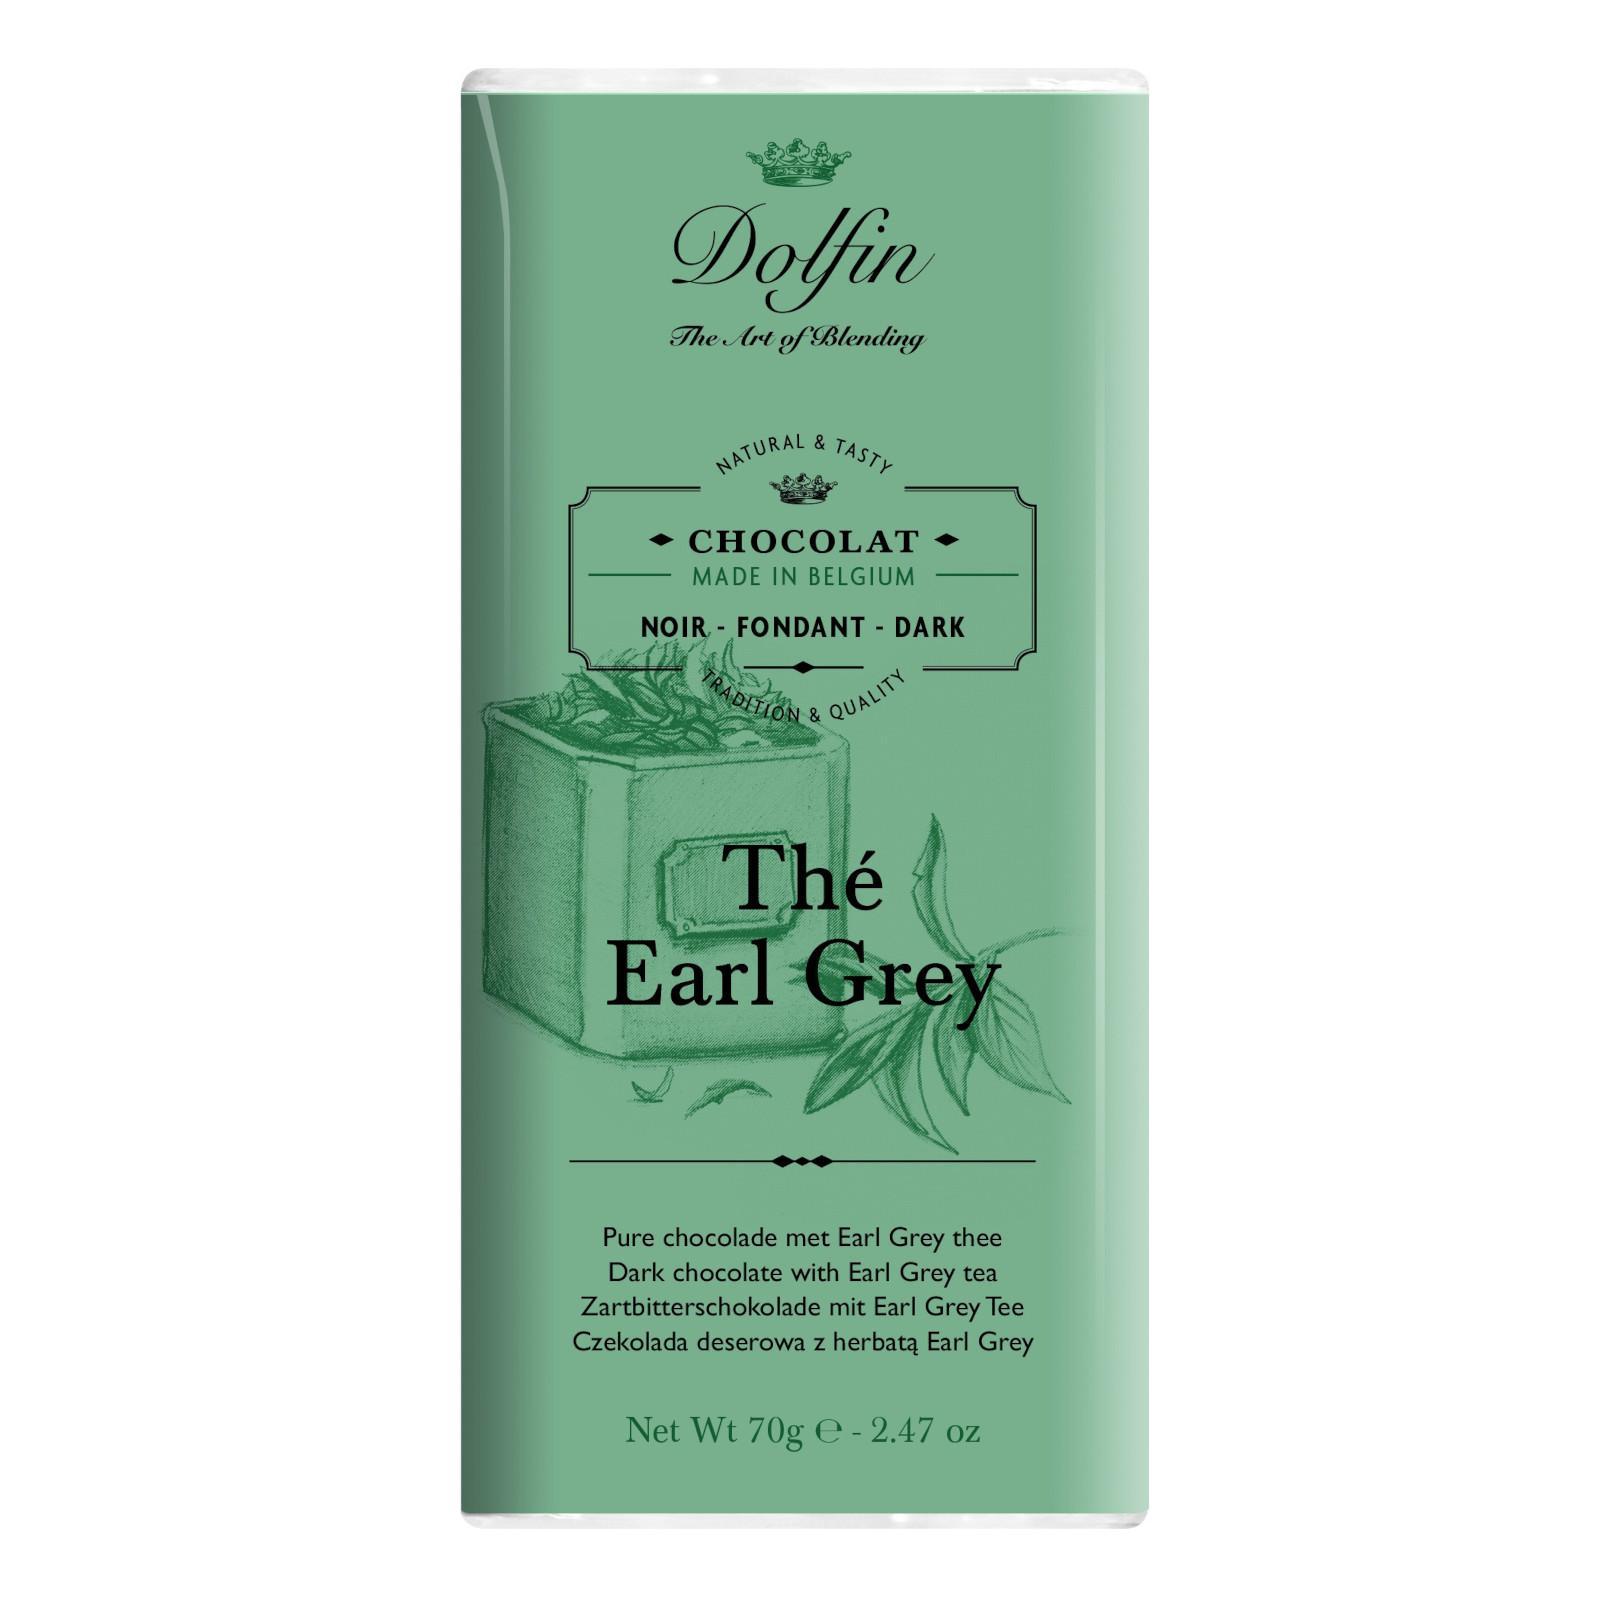 Dolfin Čokoláda hořká s čajem Earl Grey 70 g